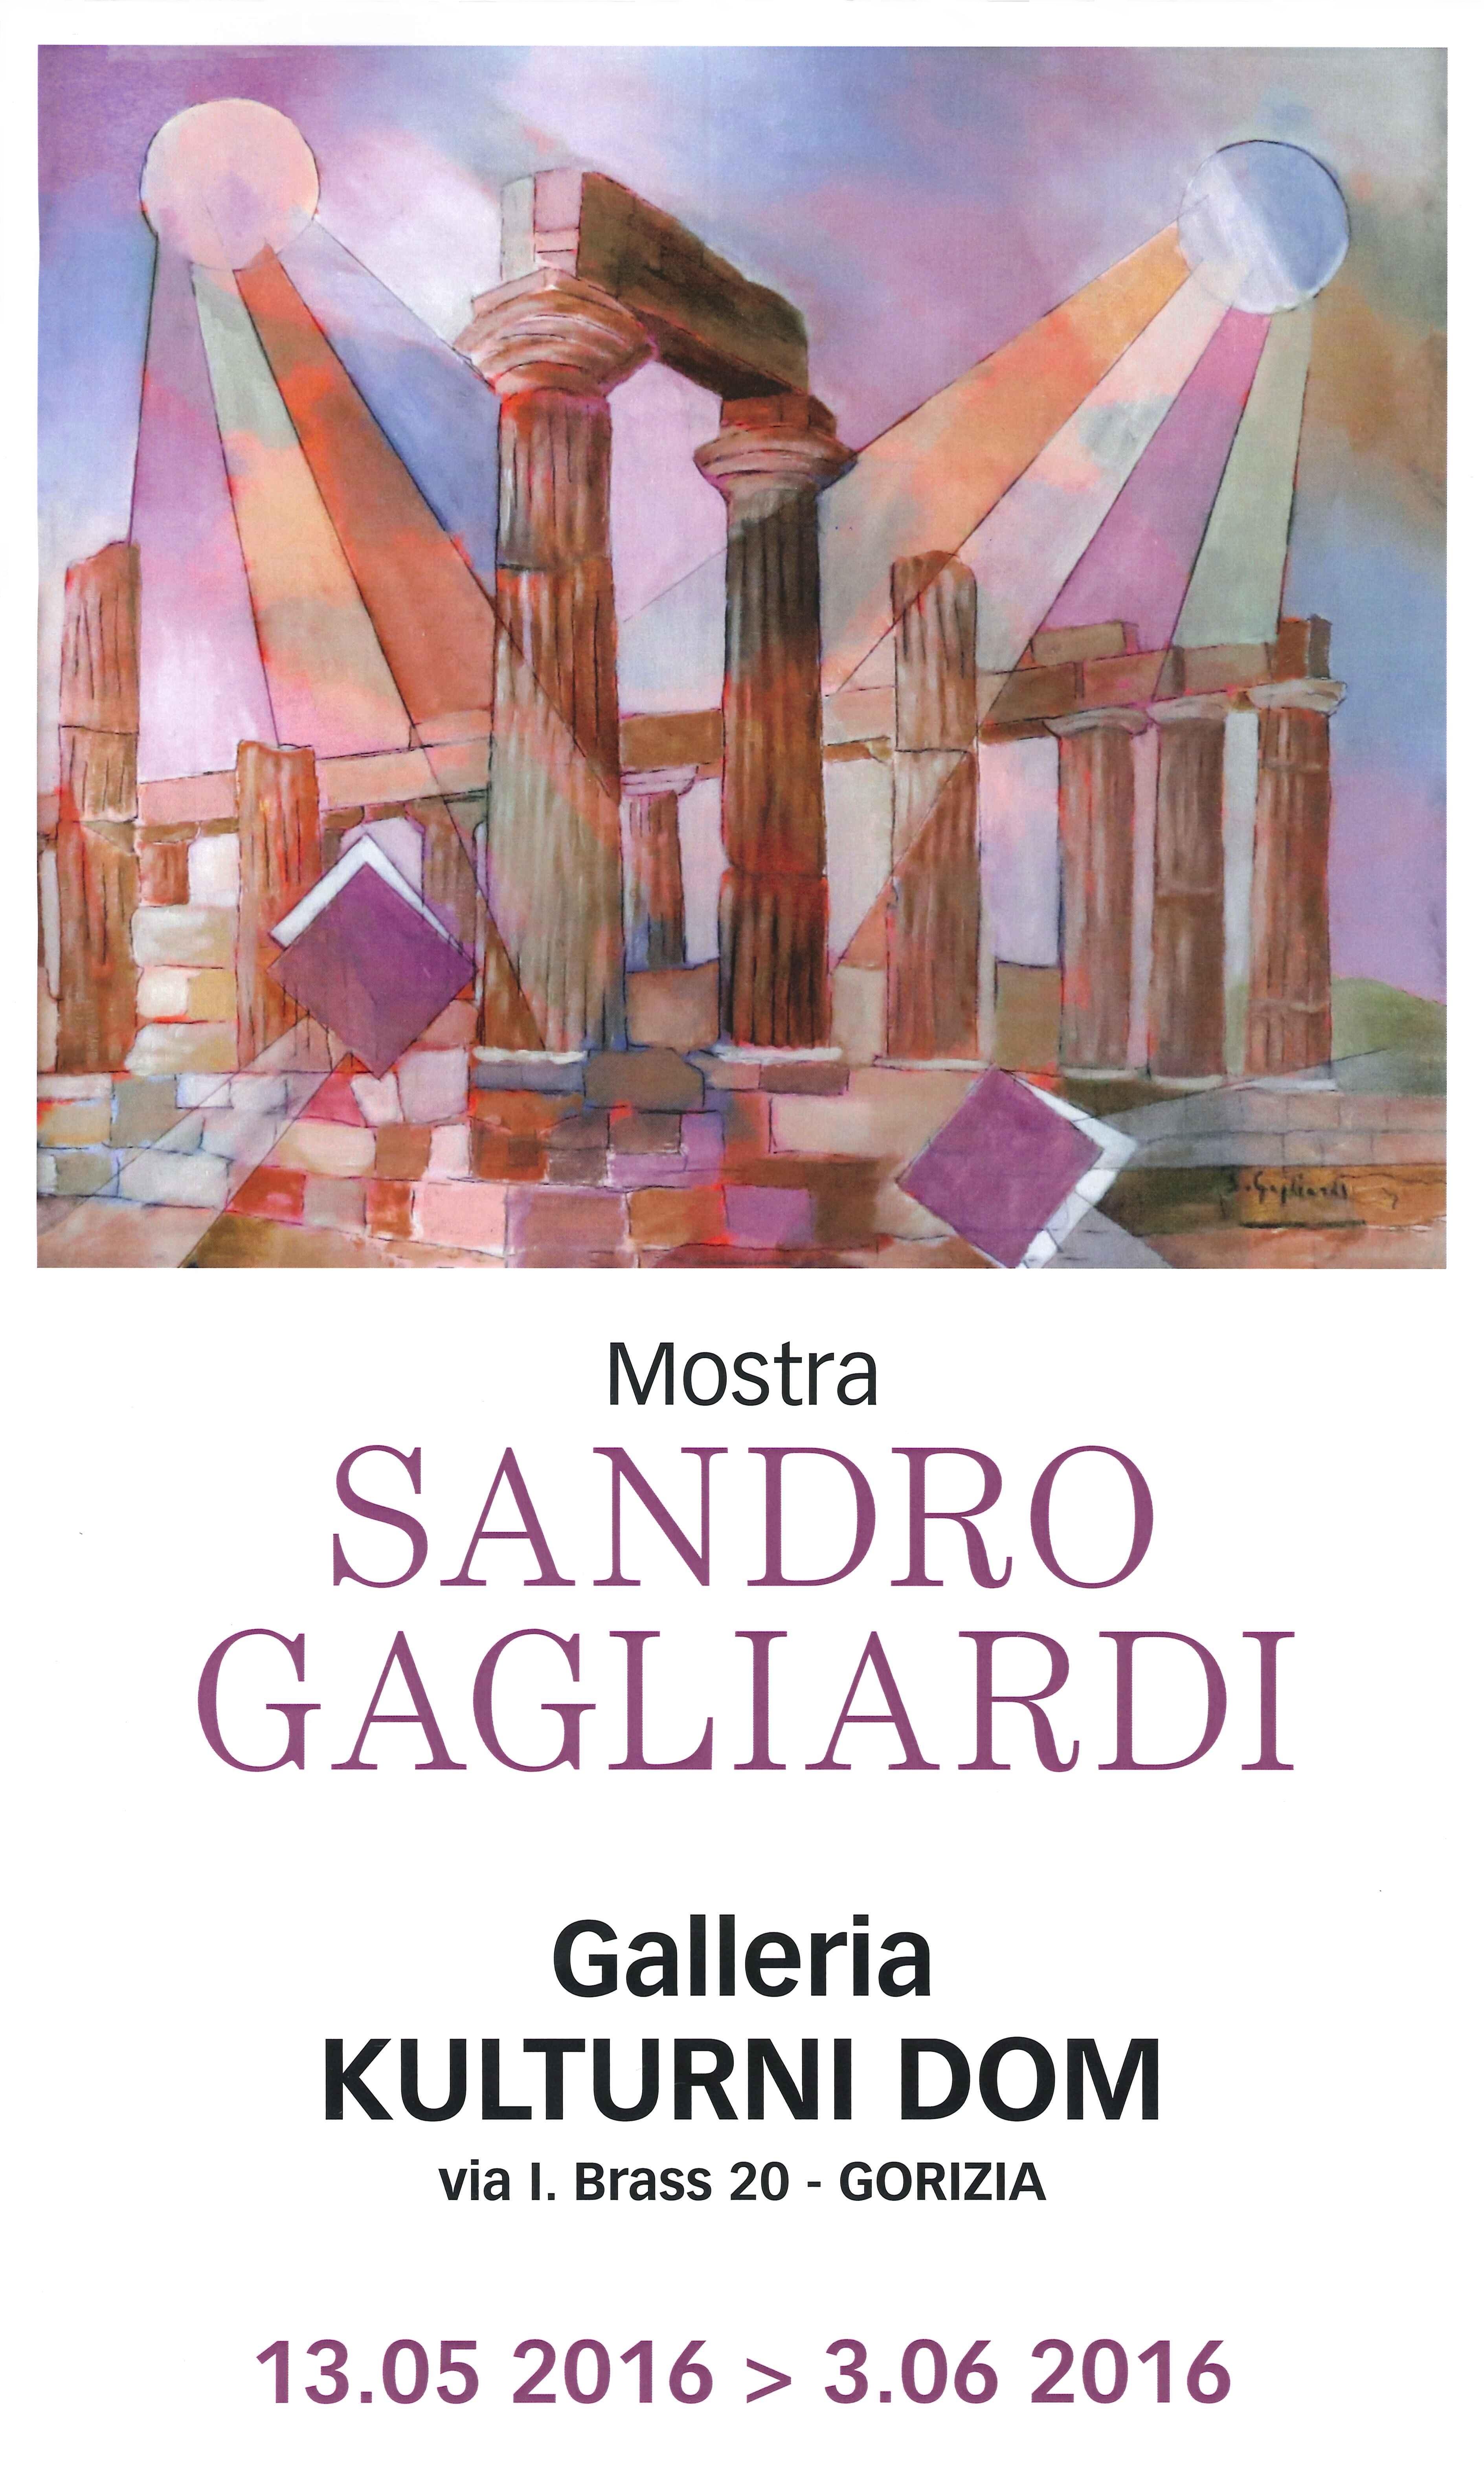 SANDRO GAGLIARDI razstava